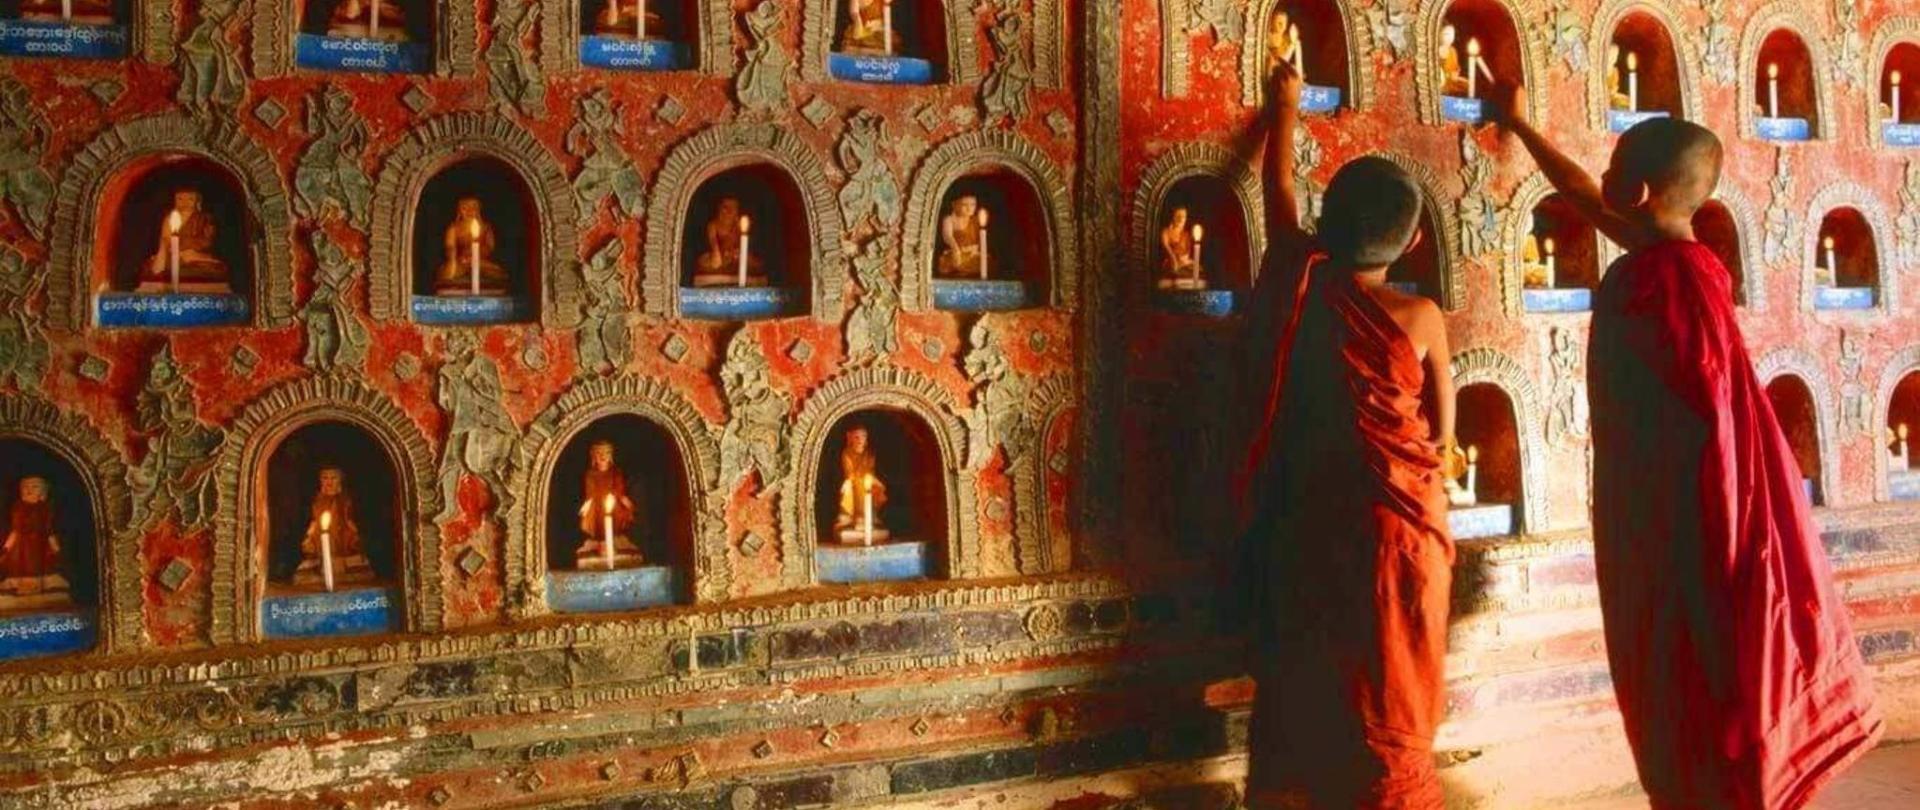 shwe-yan-pyay-monastery-2.jpg